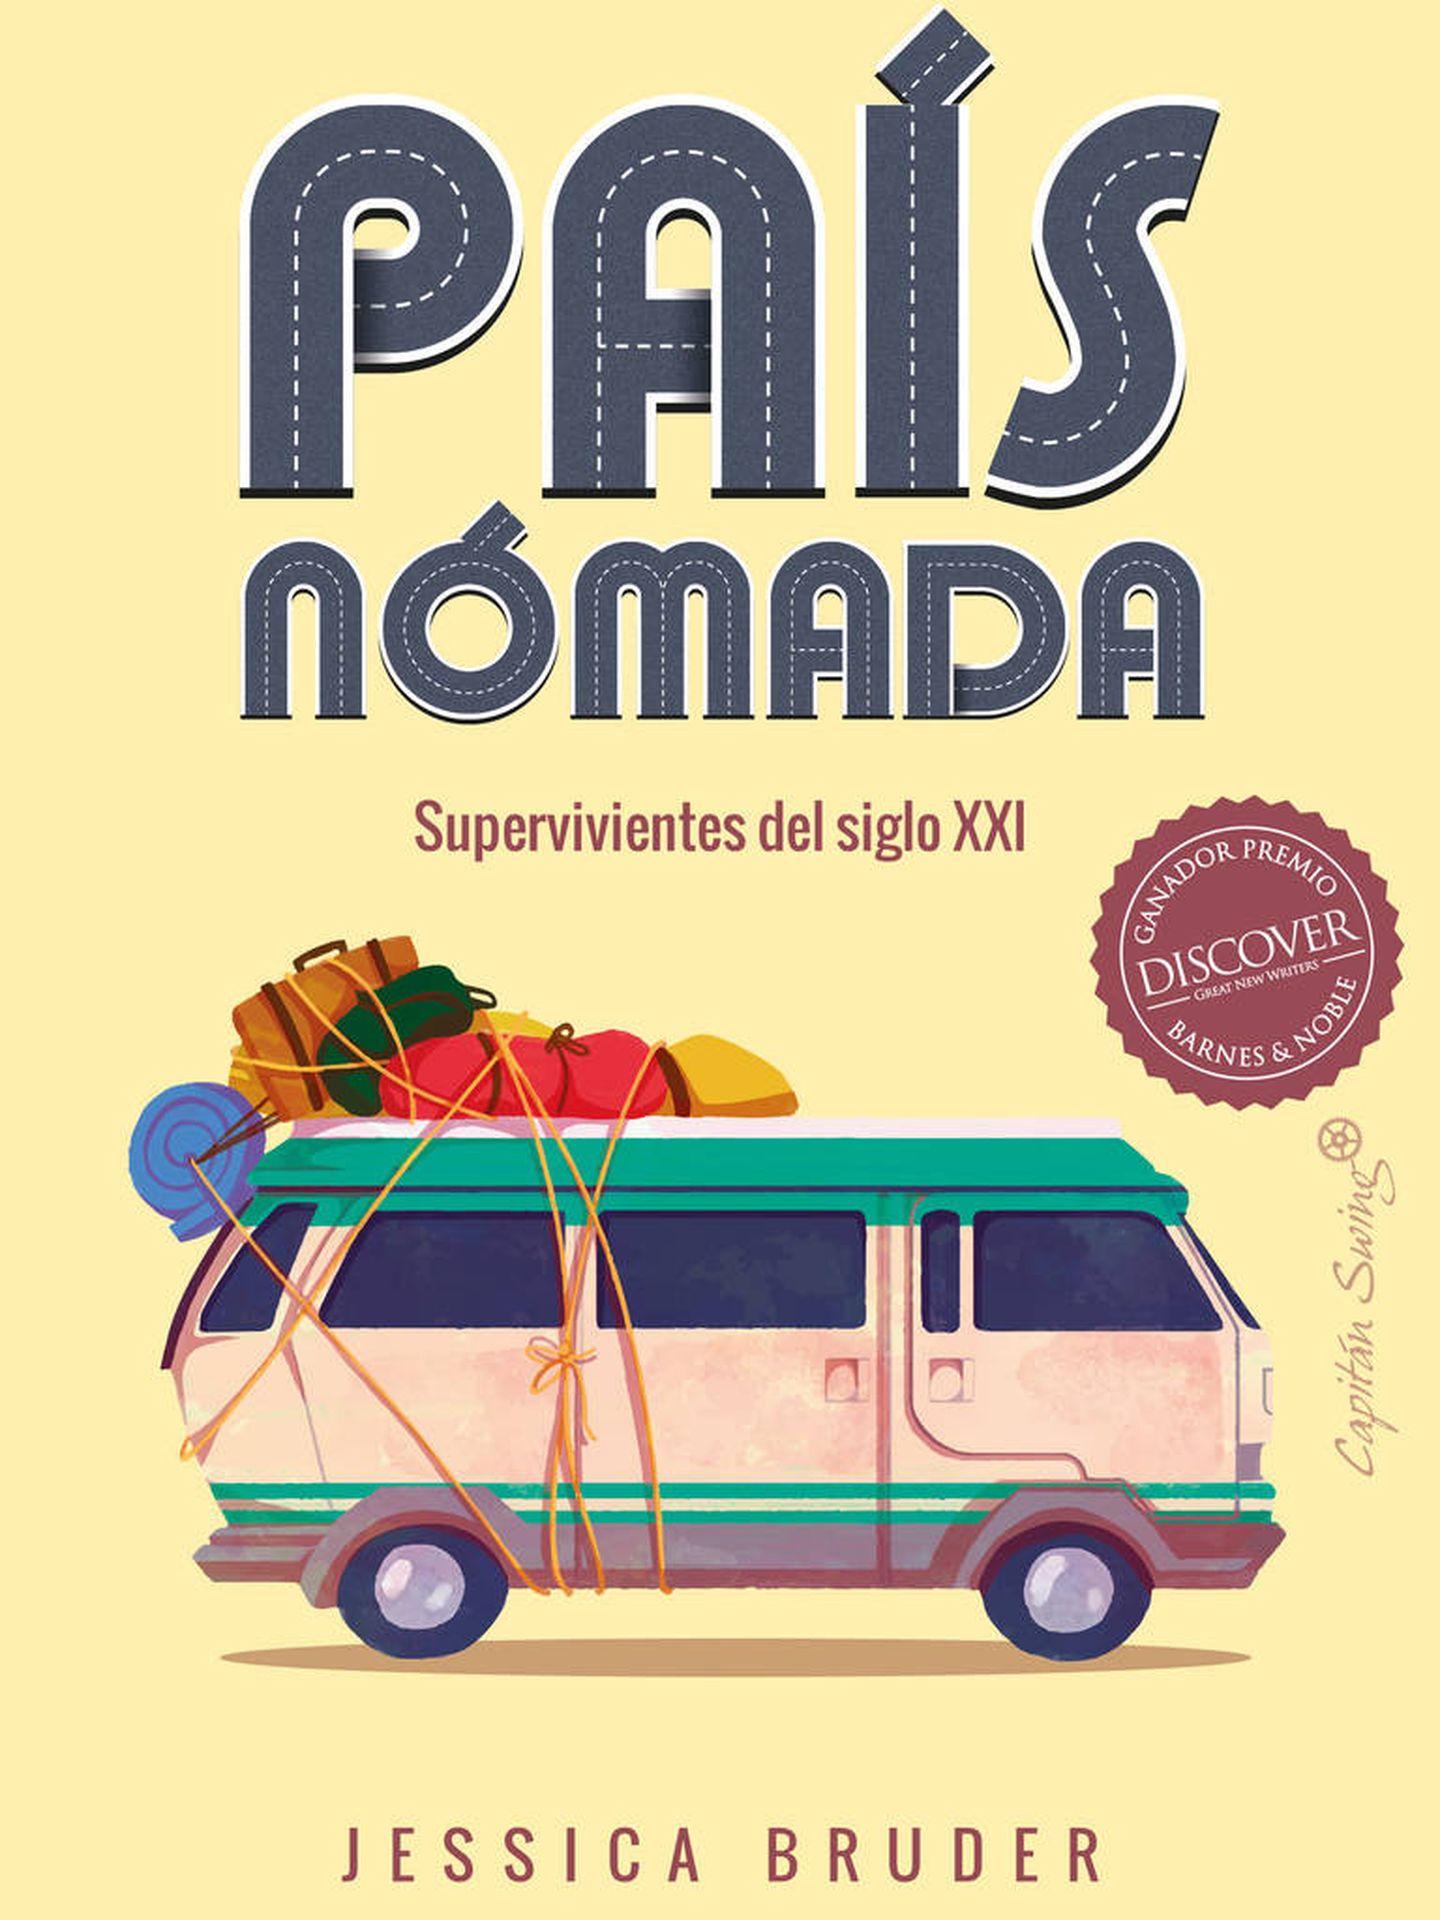 'País nómada'.